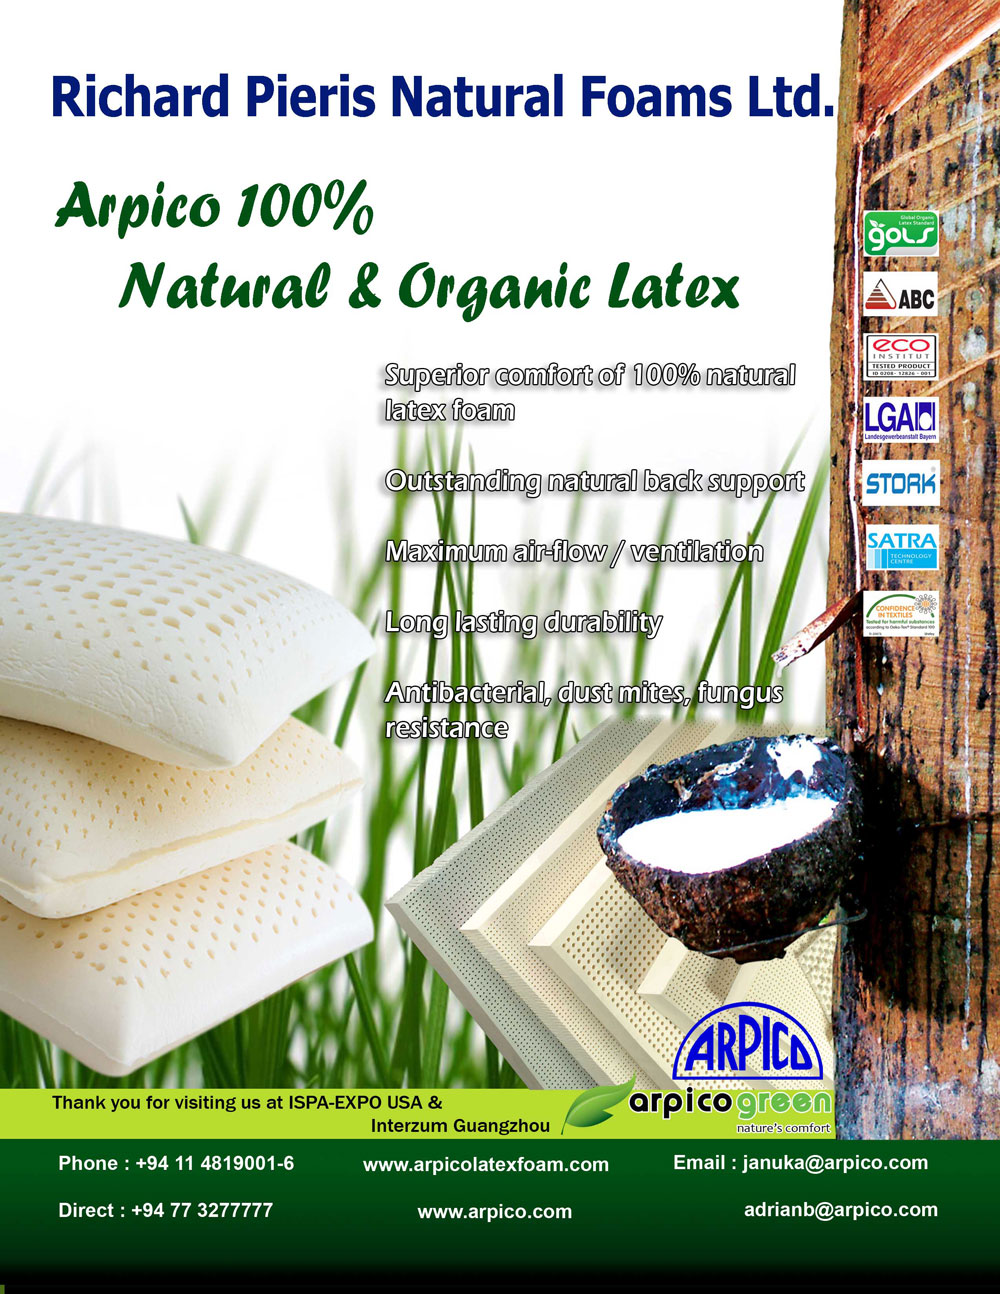 Arpico Latex - latex products manufacturers - Richard ...